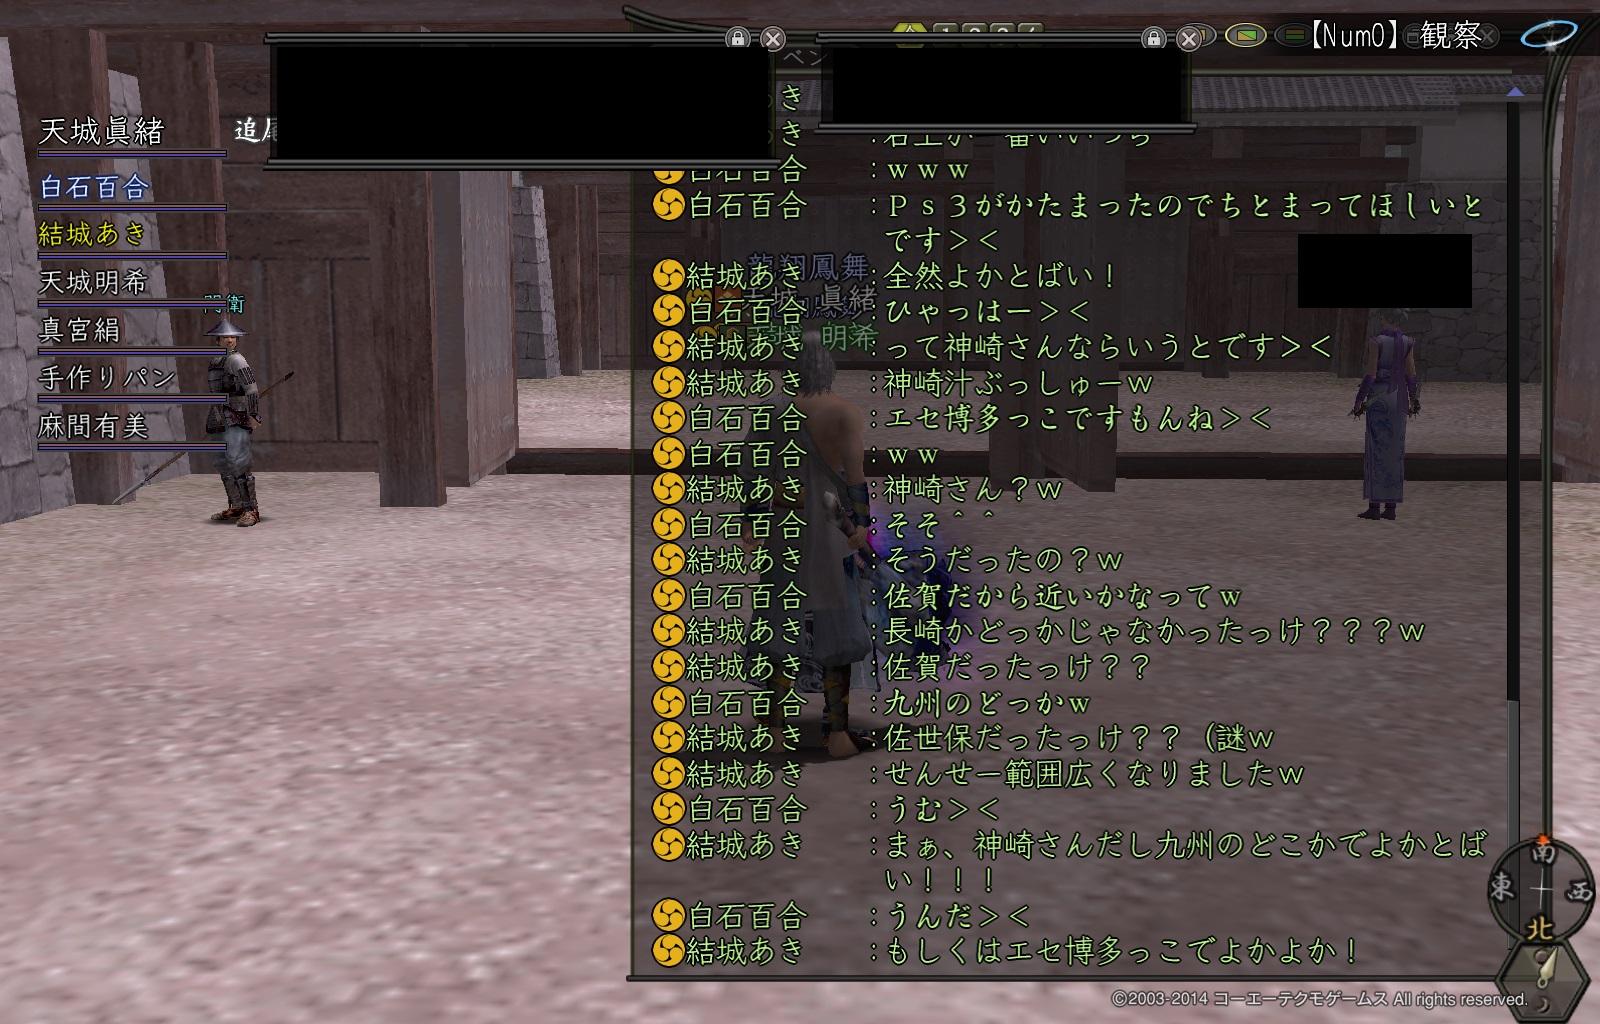 kanzakisanijiri1.jpg